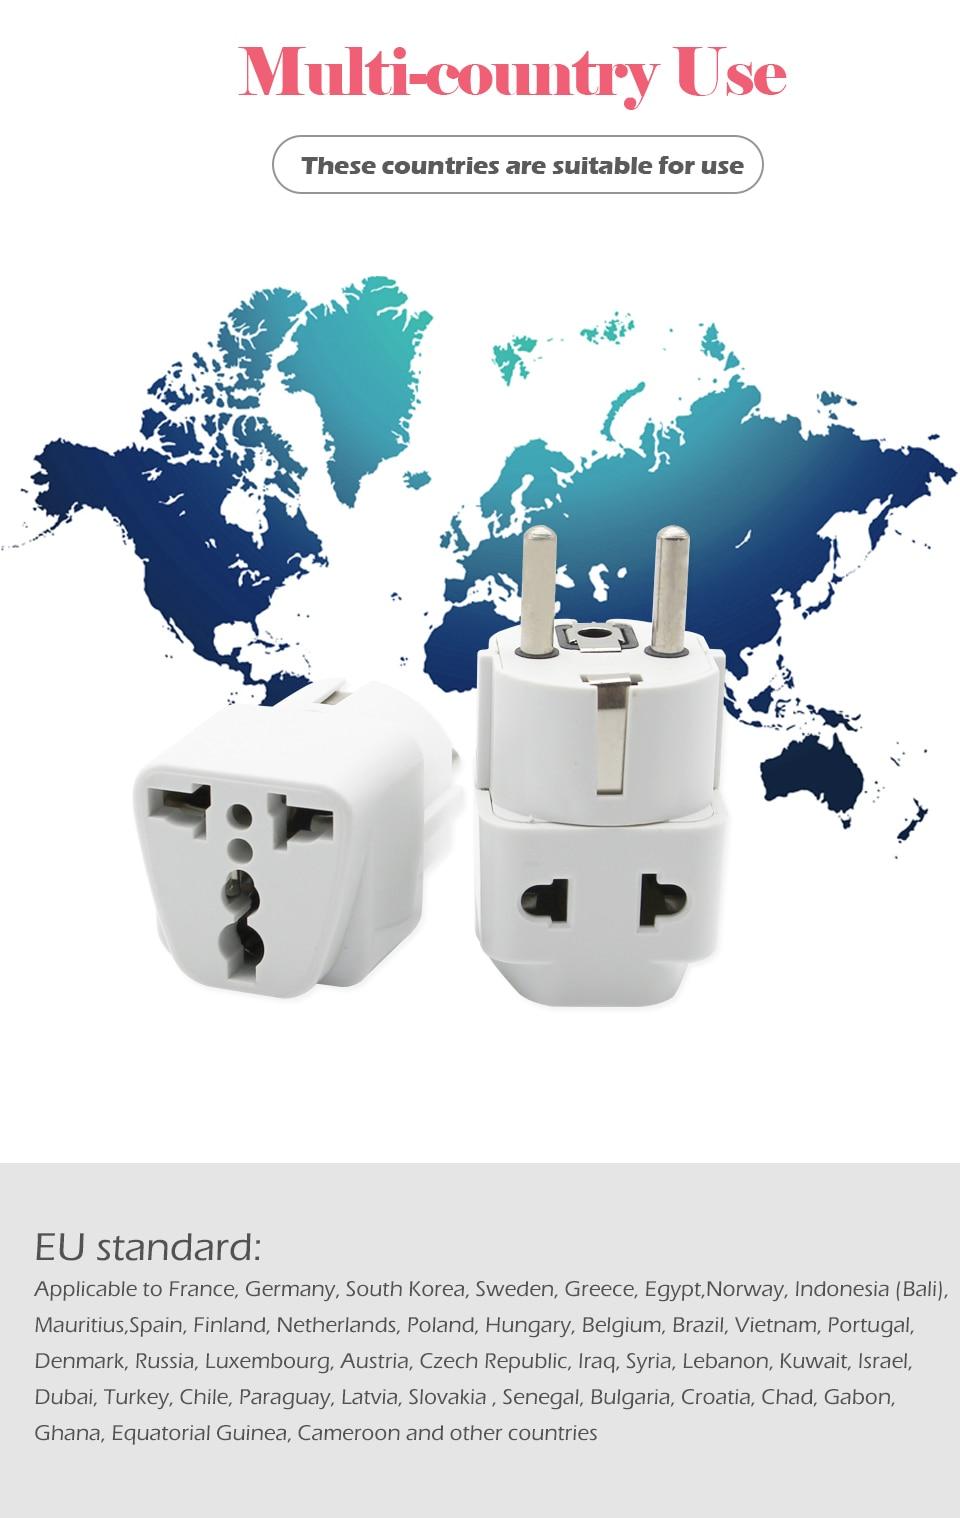 1PC European EU Plug Adapter High Quality Practical Universal US UK AU to EU Plug Travel Power Adaptor Electric Charger Sockets (5)